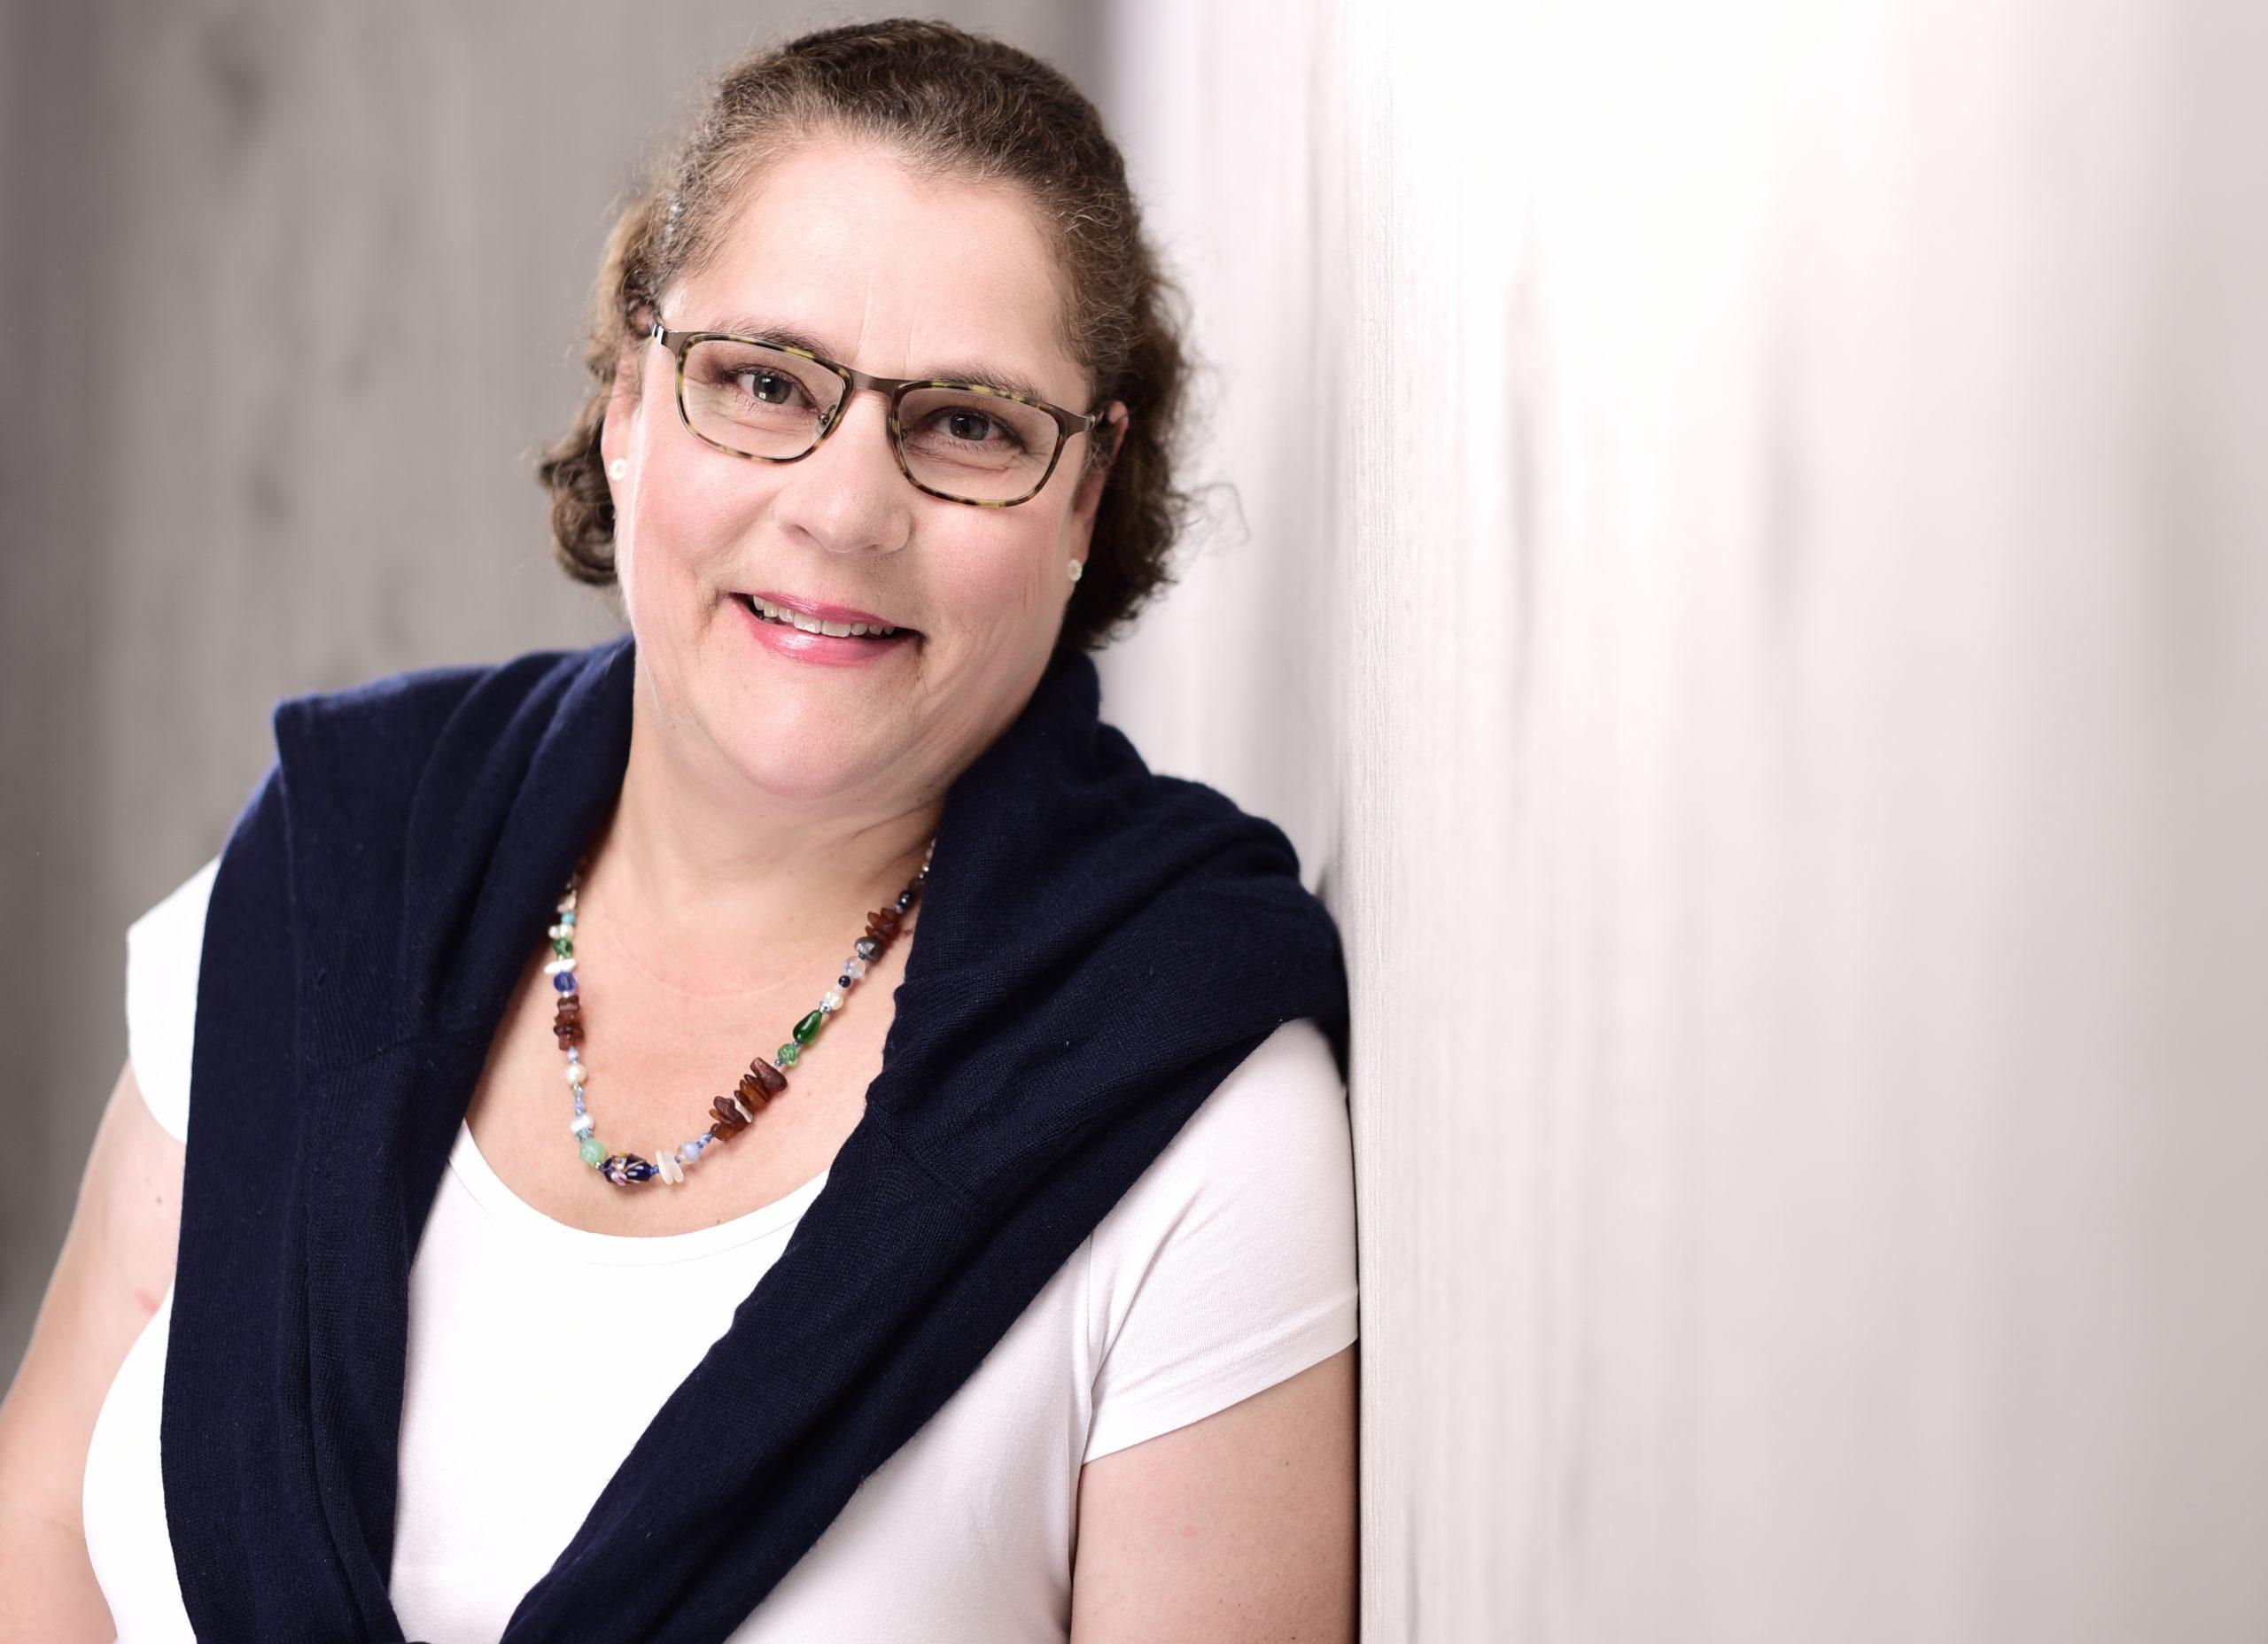 Kristina Eben - staatlich anerkannte Krankengymnastin / Physiotherapeutin